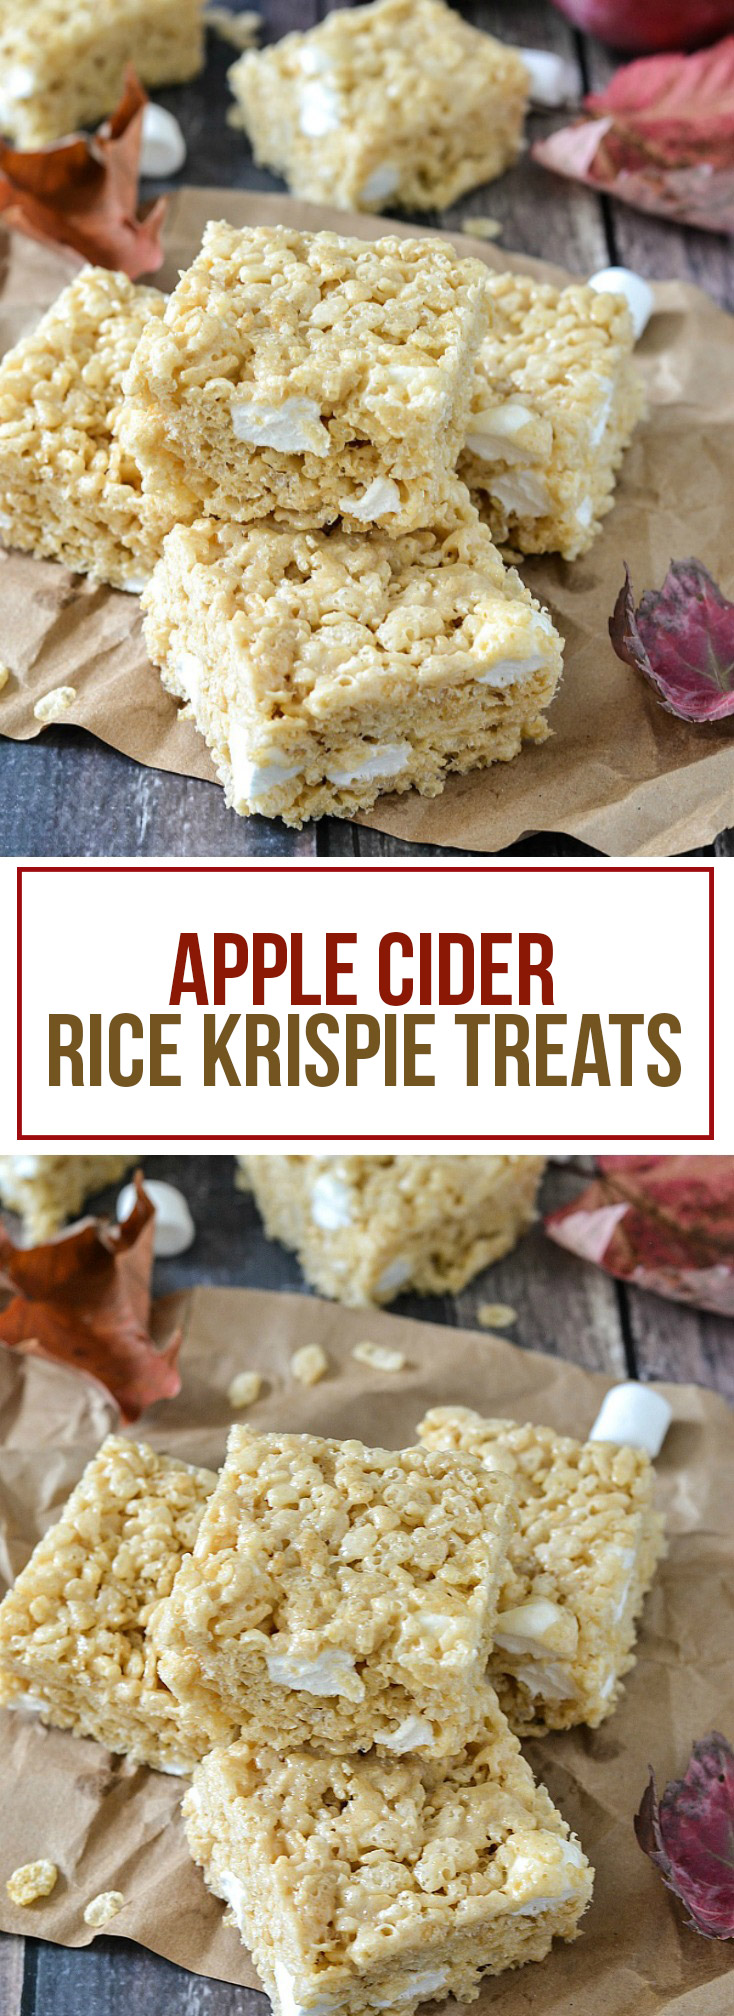 Apple Cider Rice Krispie Treats - www.motherthyme.com